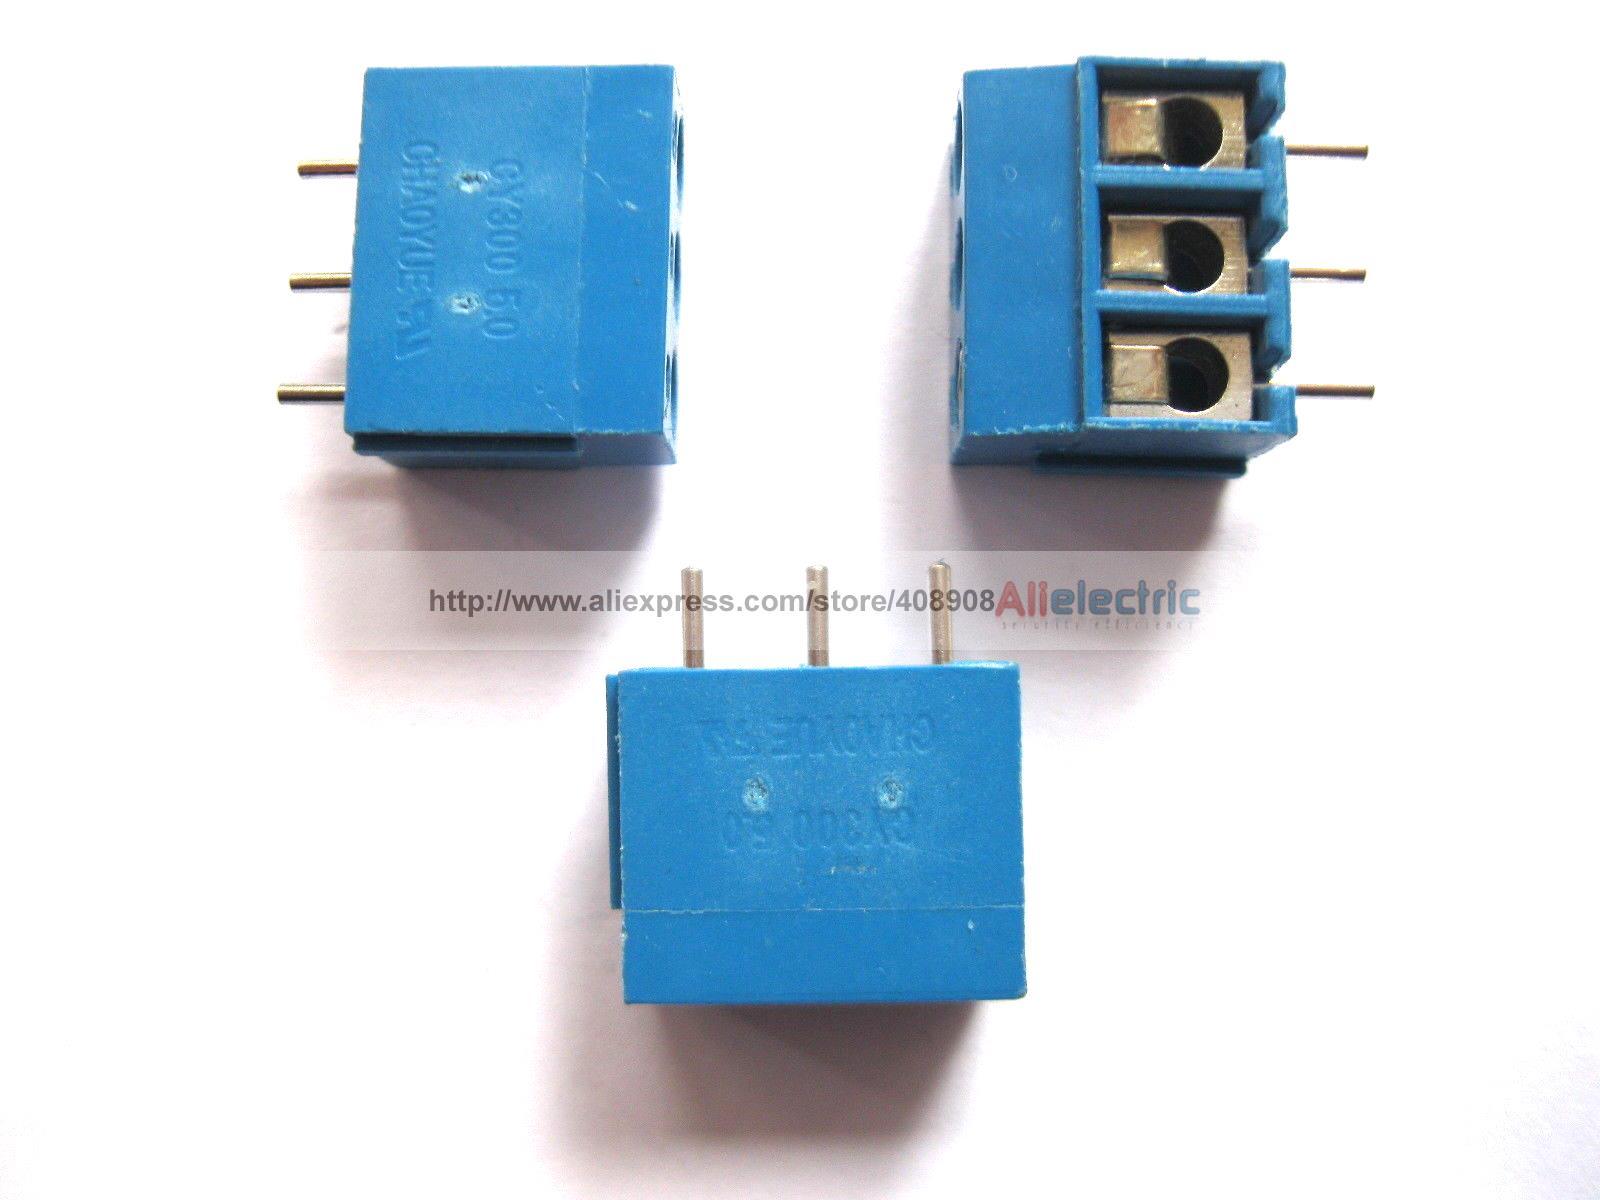 600 Pcs 3pin 5.08mm Screw Terminal Block Connector Blue CY300 3 pin curved screw terminal block connectors green 20 piece pack